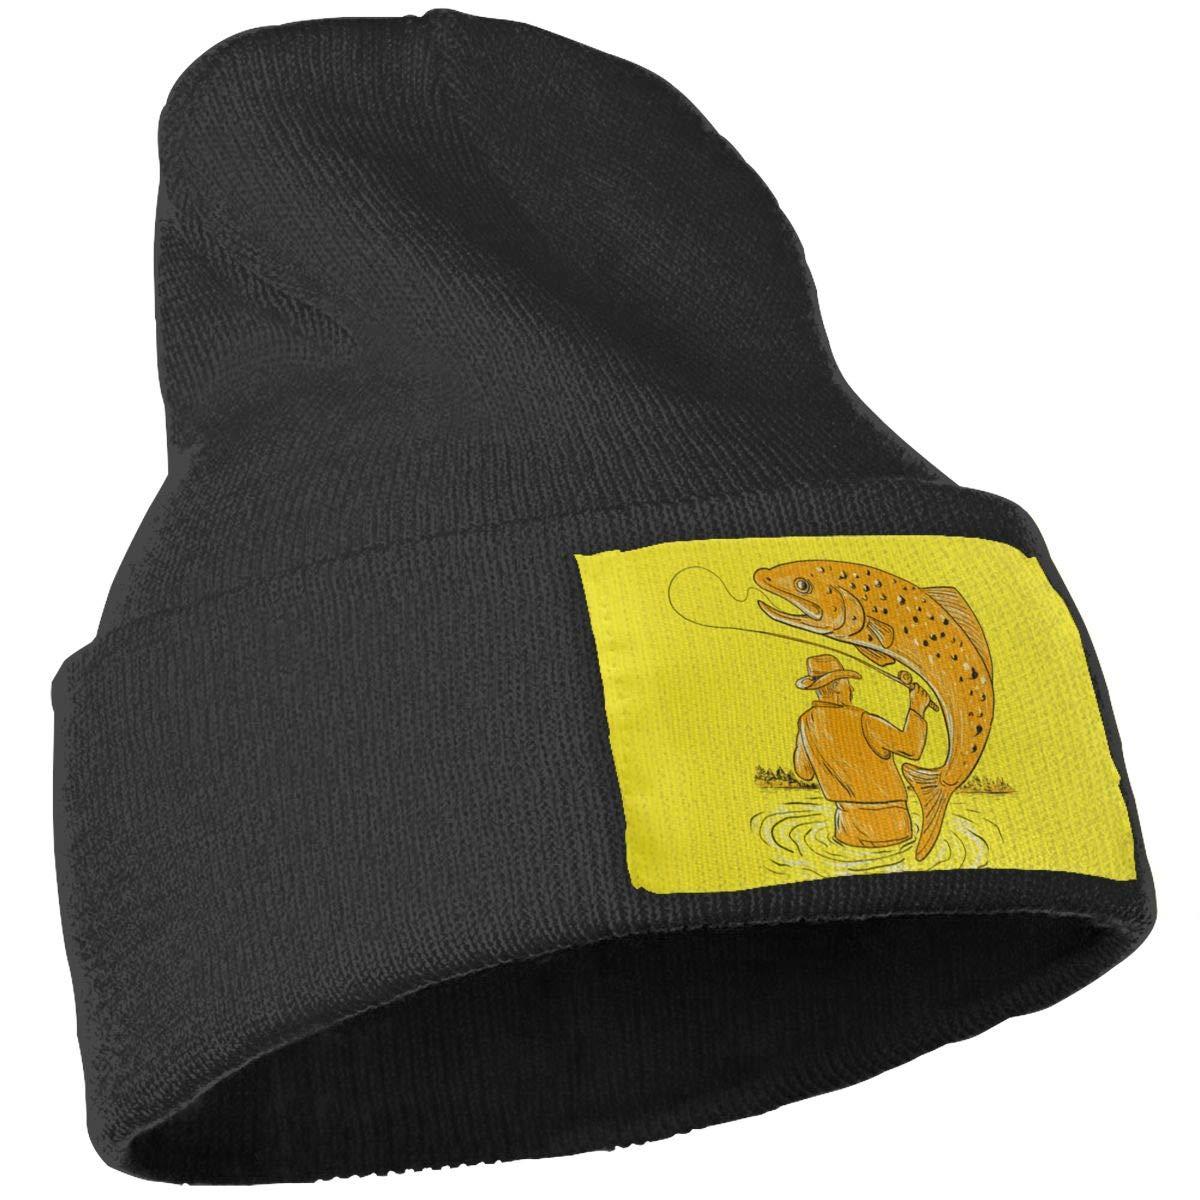 Oopp Jfhg Fisherman Fishing Trout Wool Cap Beanie Hat Unisex Winter